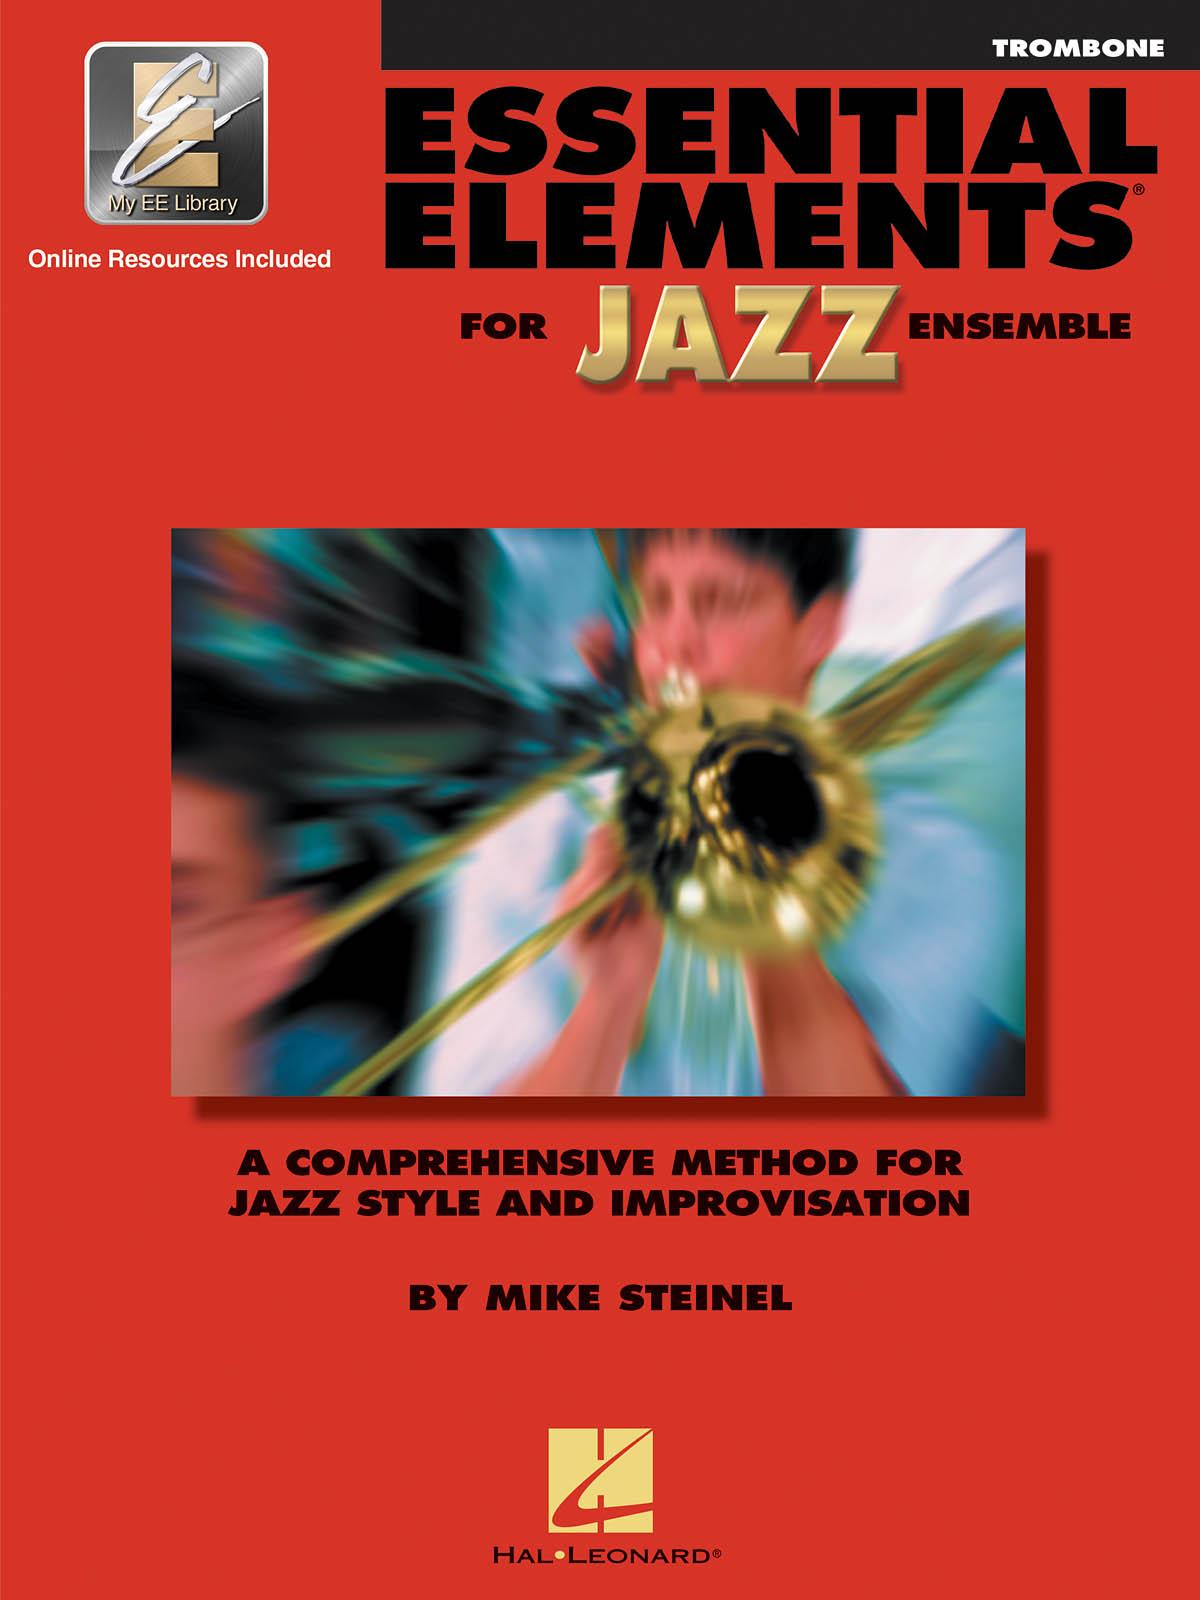 Essential Elements for Jazz Ensemble (Trombone): Jazz Ensemble: Book & Audio